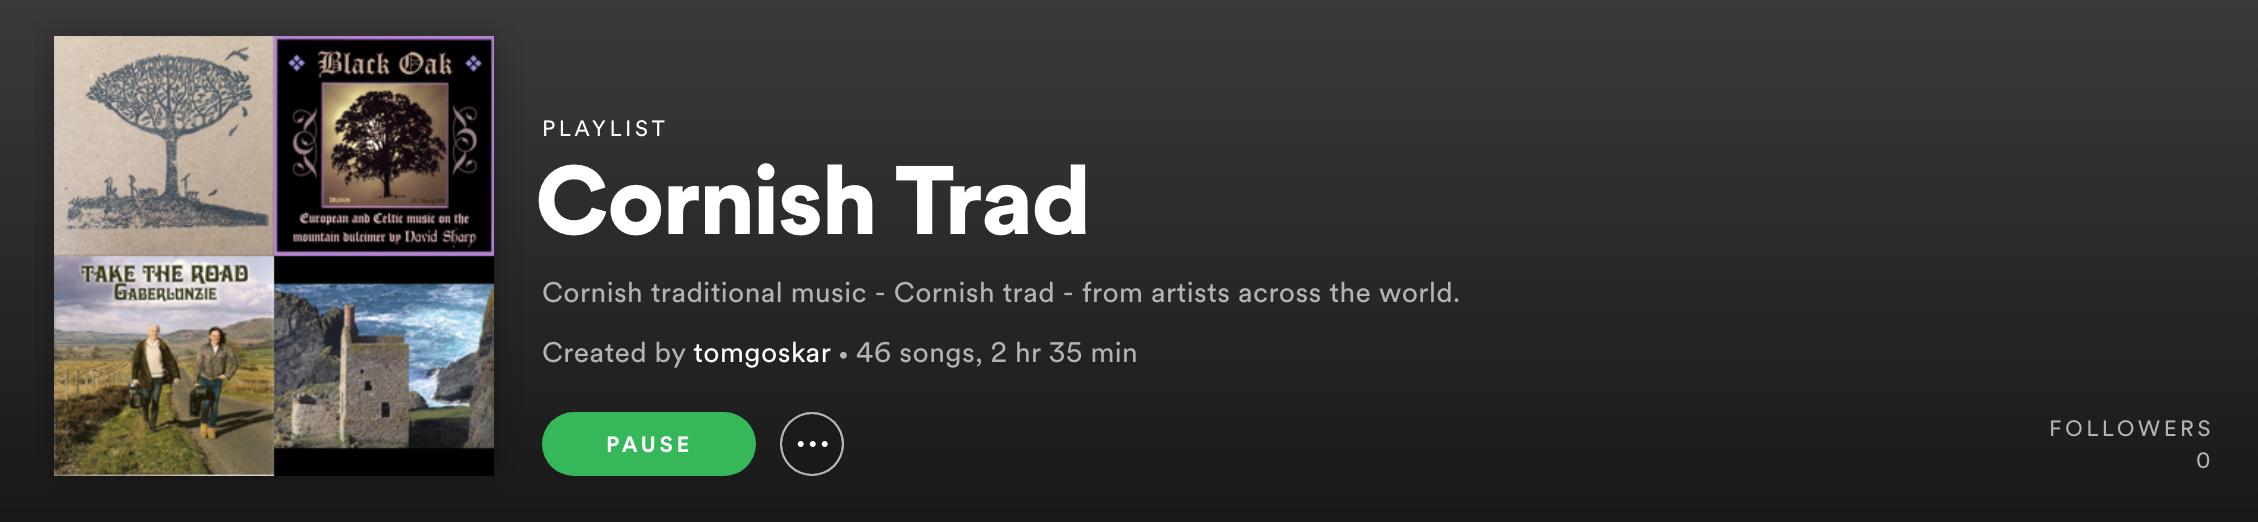 Screenshot of the Spotify playlist.